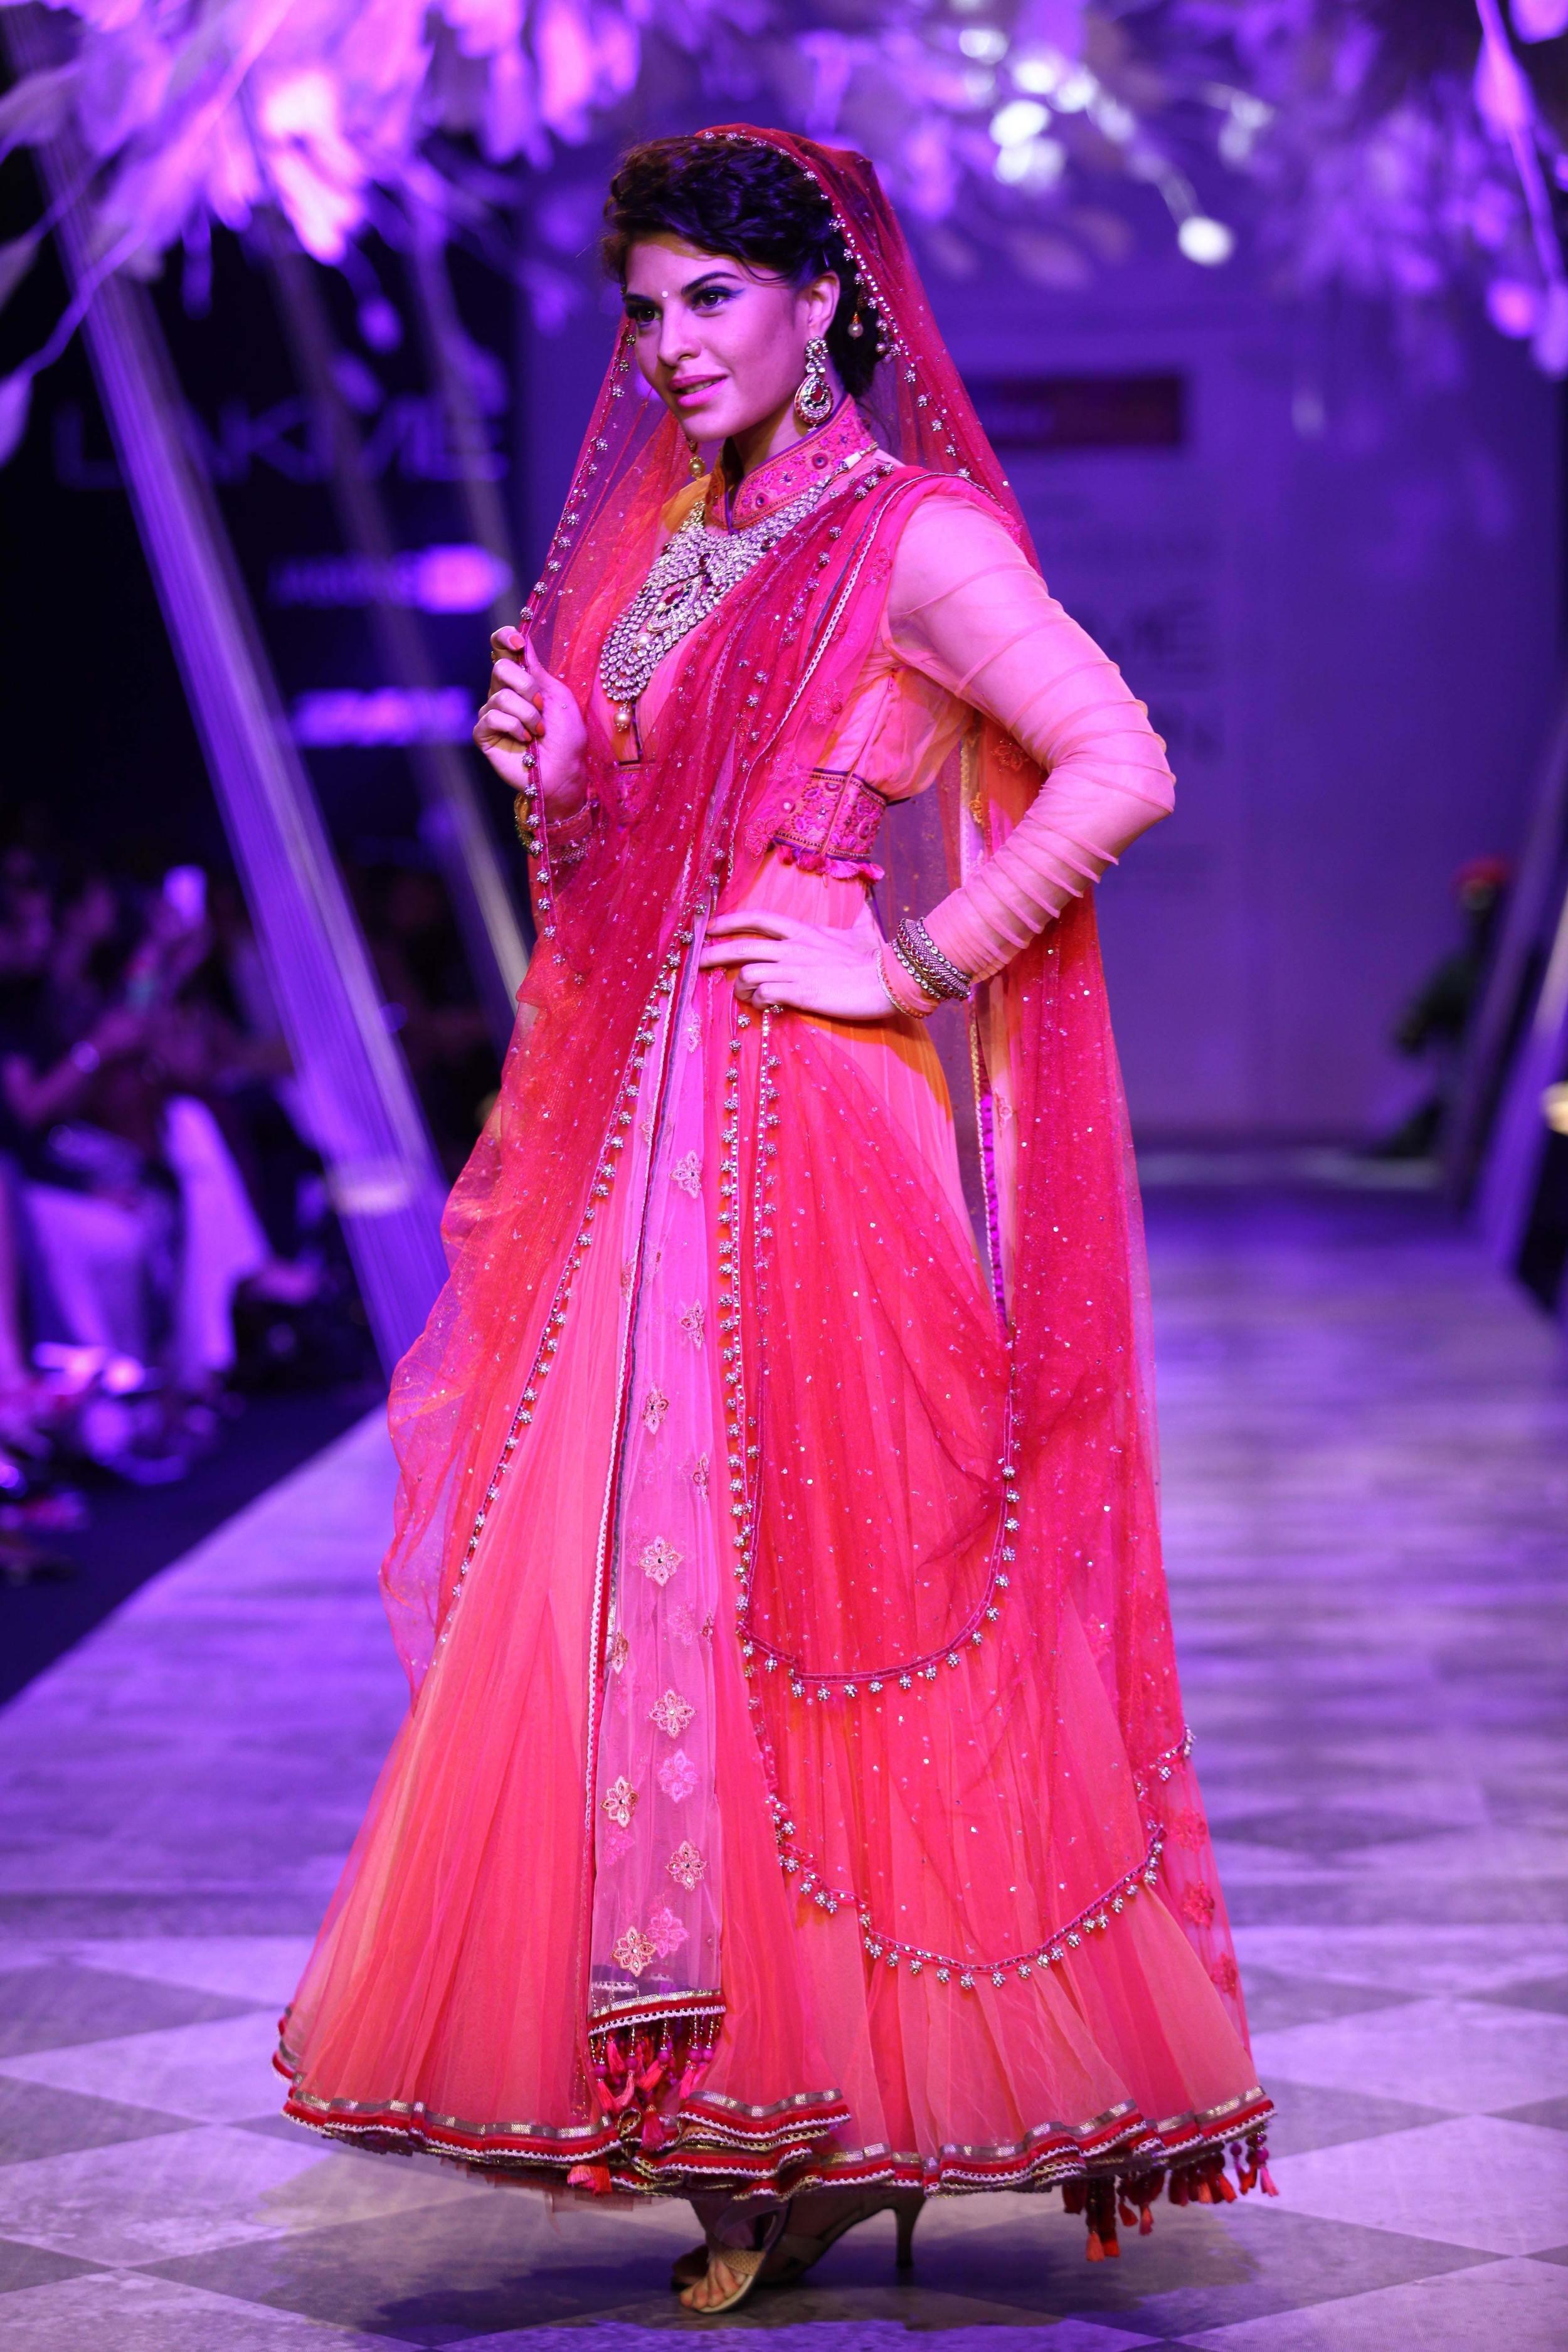 Jacqueline Fernandez for Tarun Tahiliani SS'14 Collection at LFW SR 2014 2.jpg